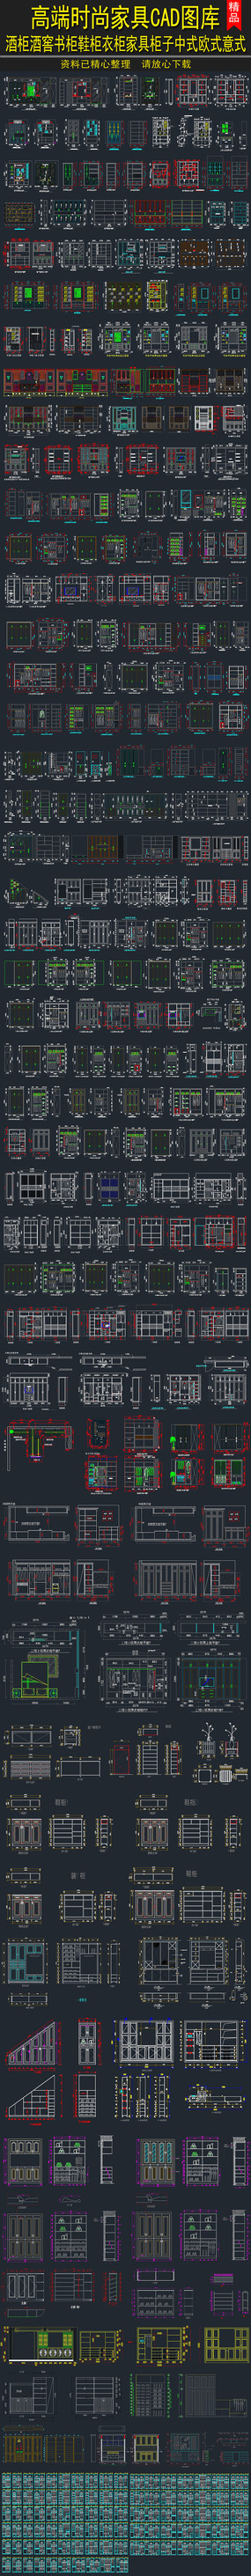 酒柜书柜鞋柜衣柜CAD图库